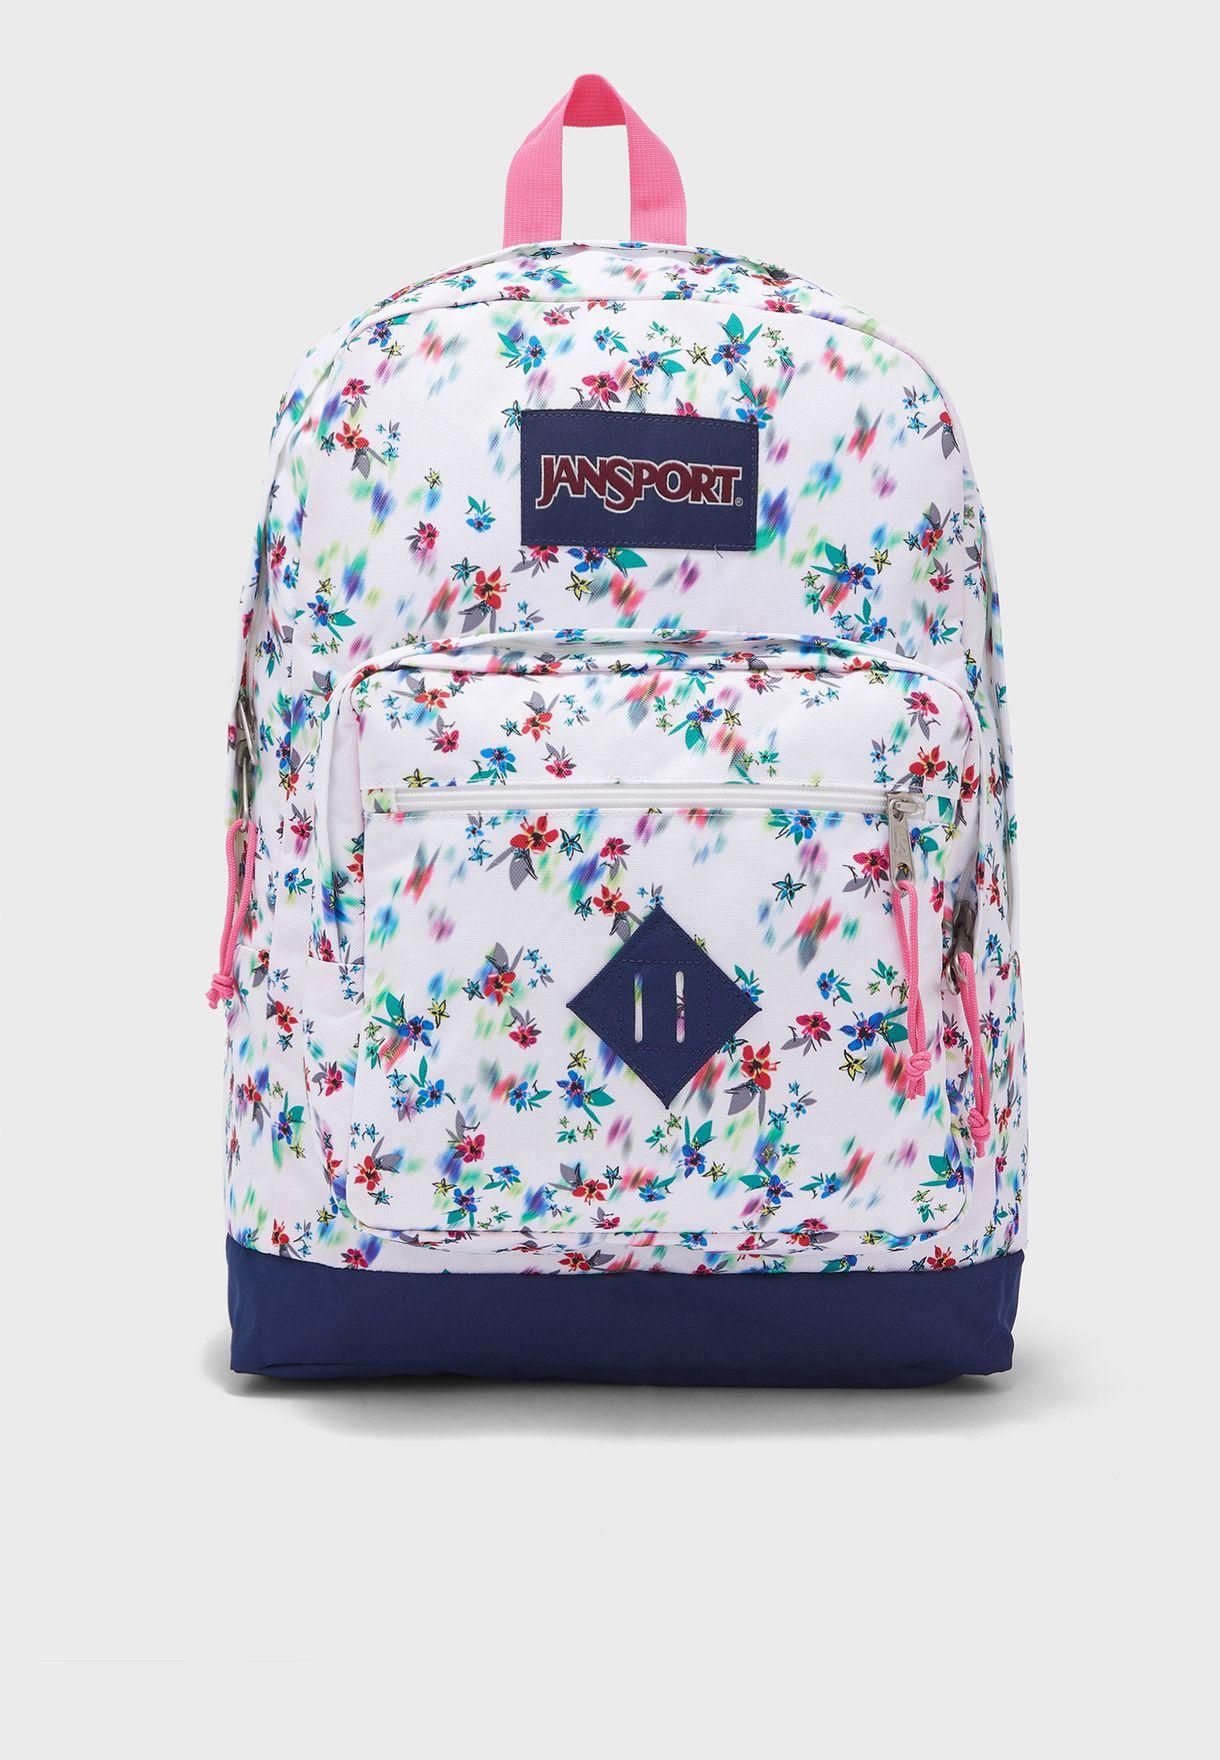 55420aece Shop Jansport prints City Scout Backpack JS00T29A0VZ for Women in ...